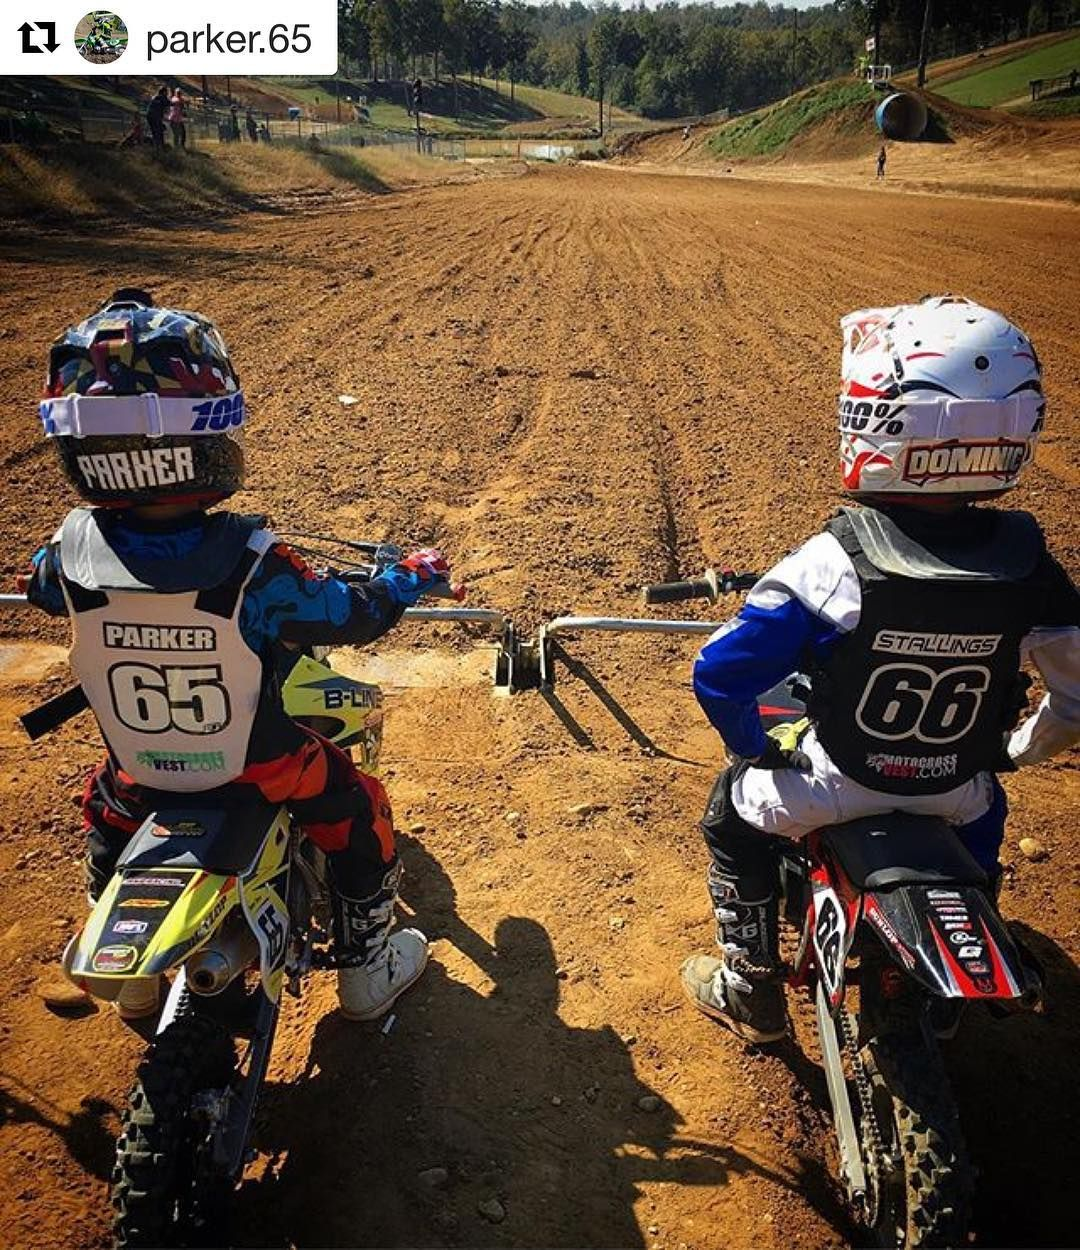 Train Hard Zener Parker Davis Repost Parker 65 Maryland Boys Maryland Motocross Blineracing Cobramoto Oneindustries Instagram Posts B Line Motocross